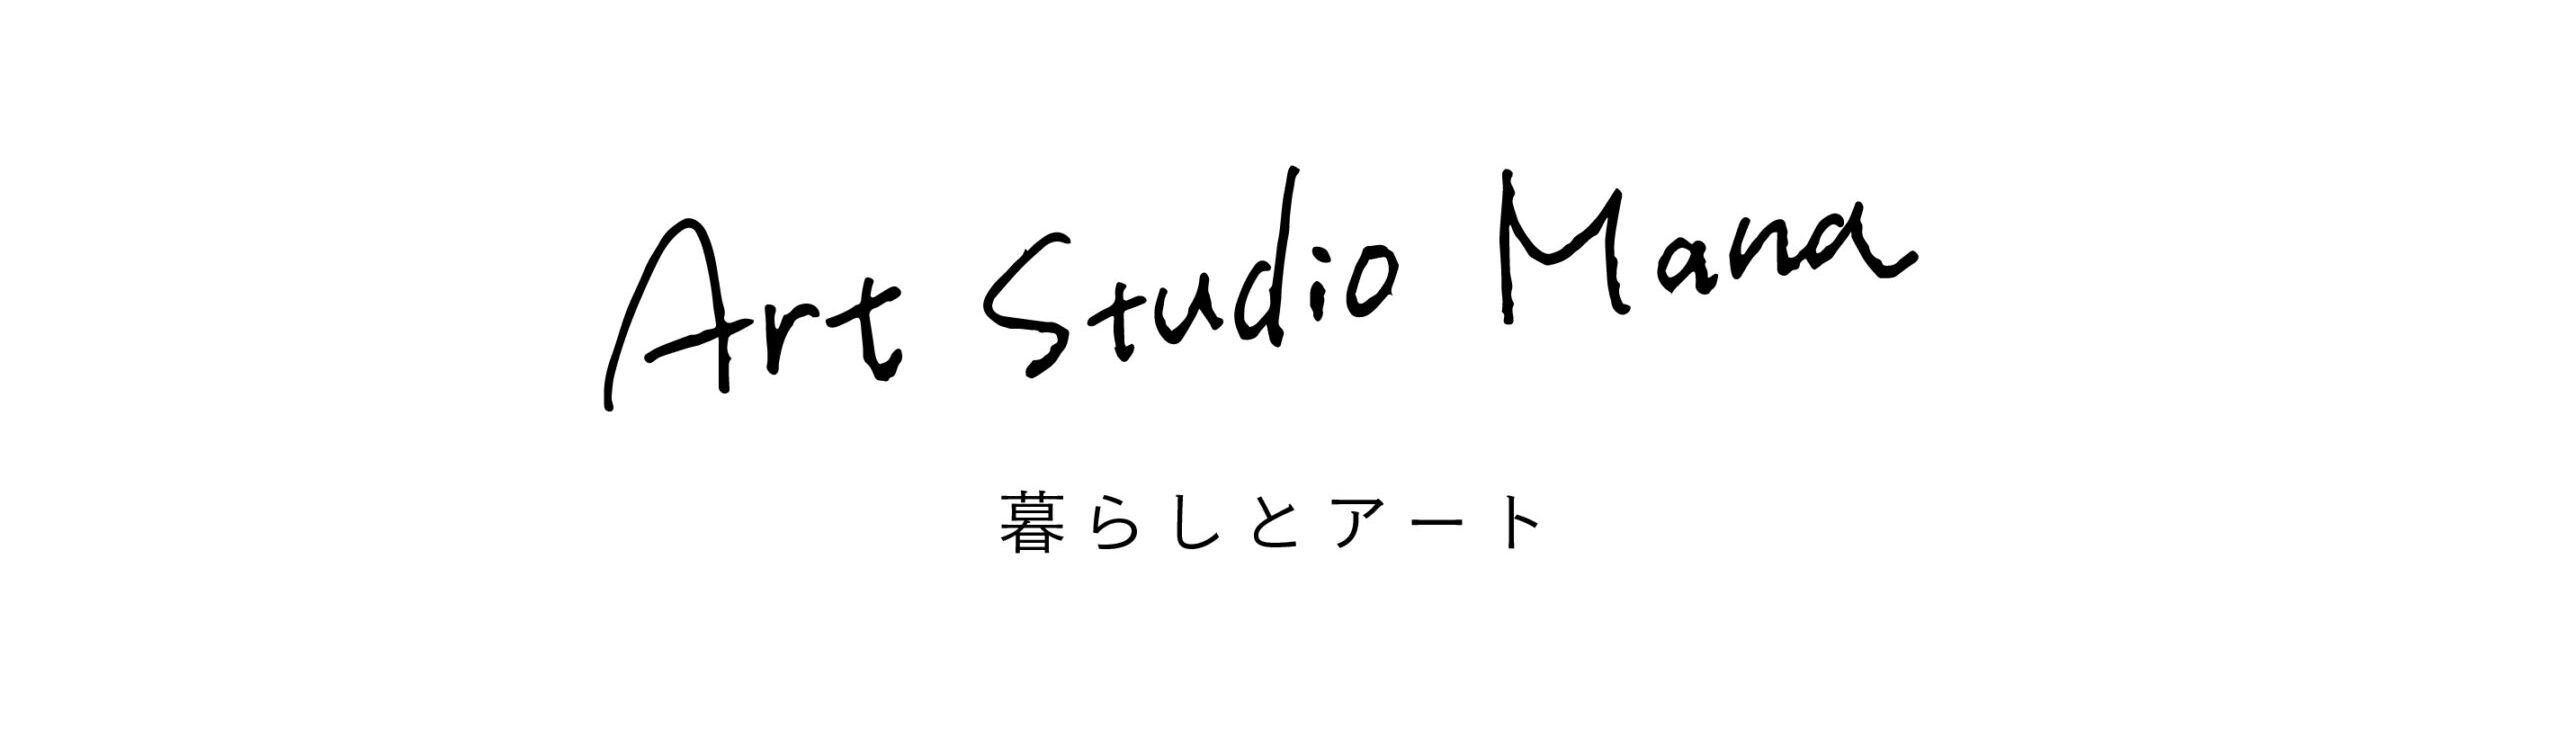 Art Studio Mana